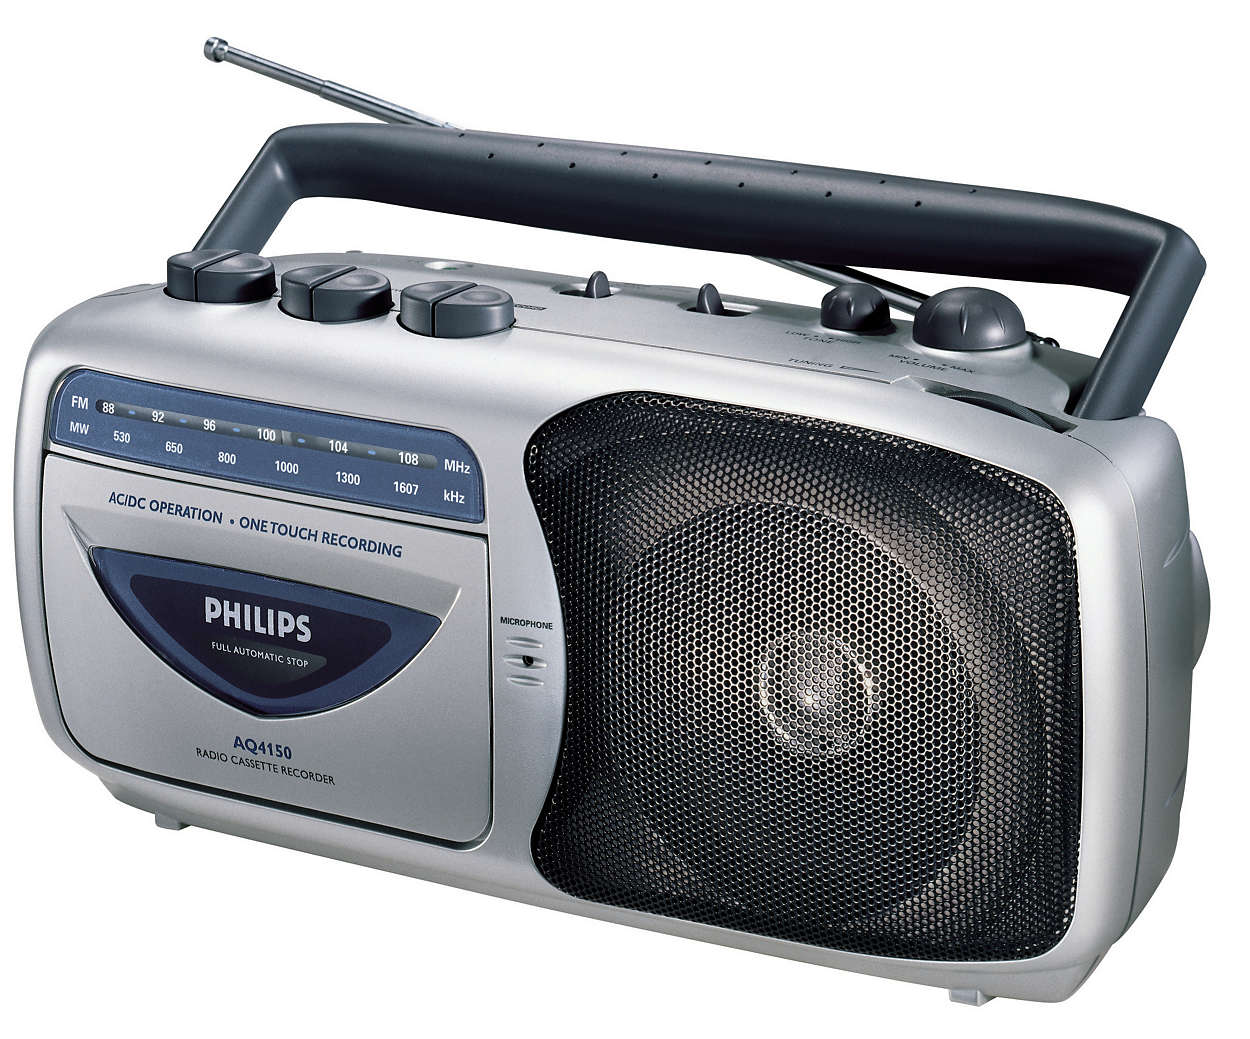 Radiocasete portátil.